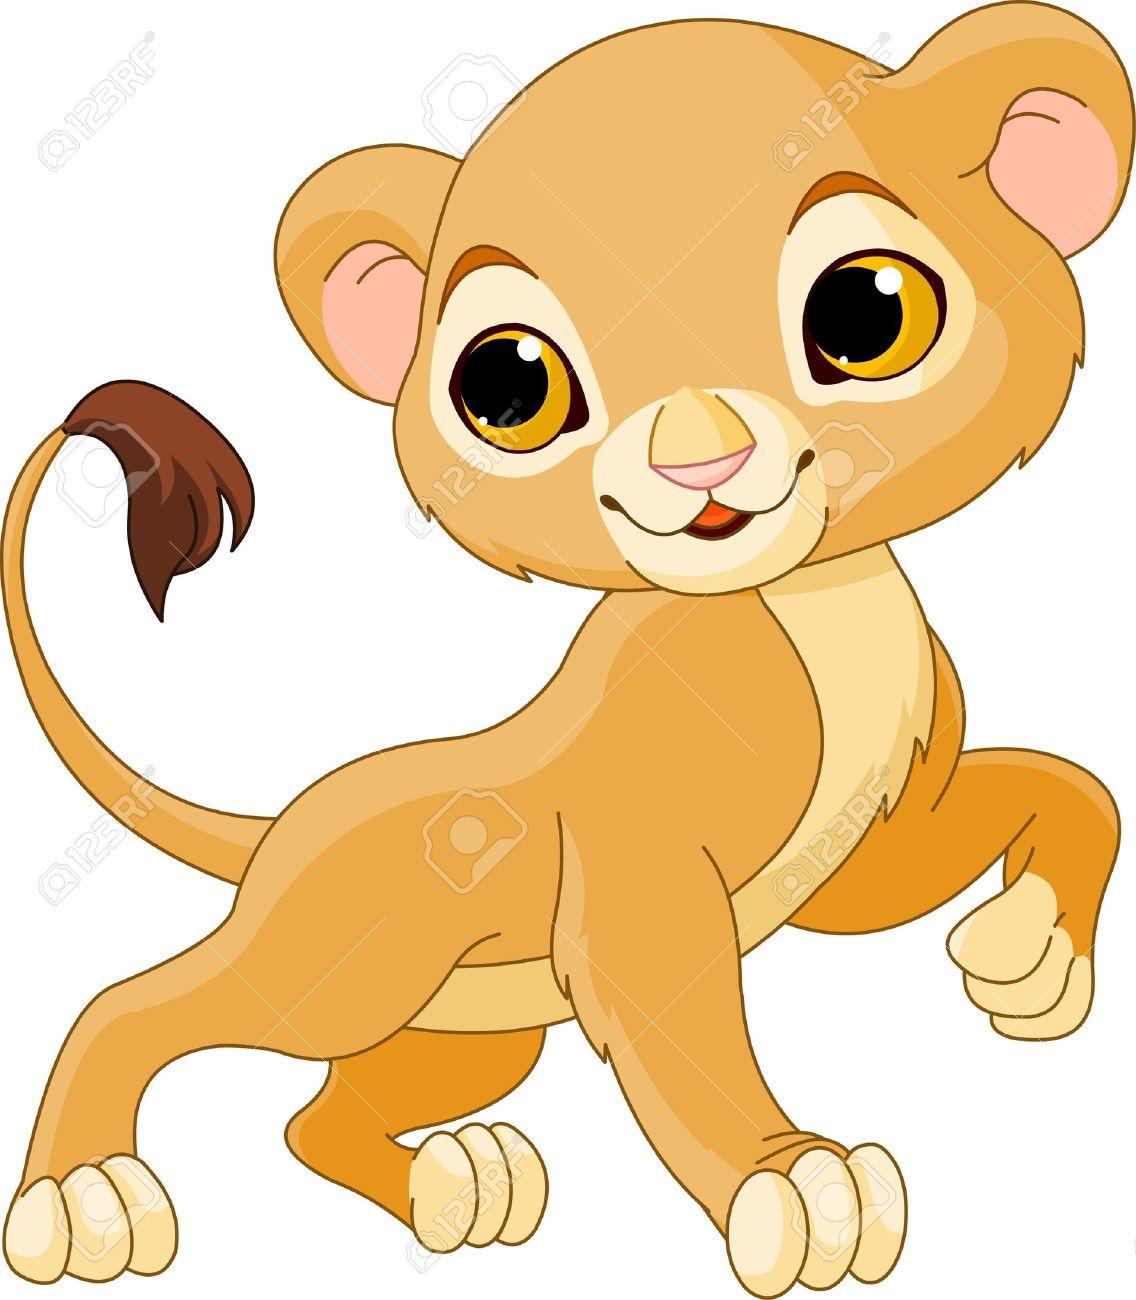 brave cute lion cub of a white background royalty free cliparts rh 123rf com lion cub clip art free cartoon lion cub clipart